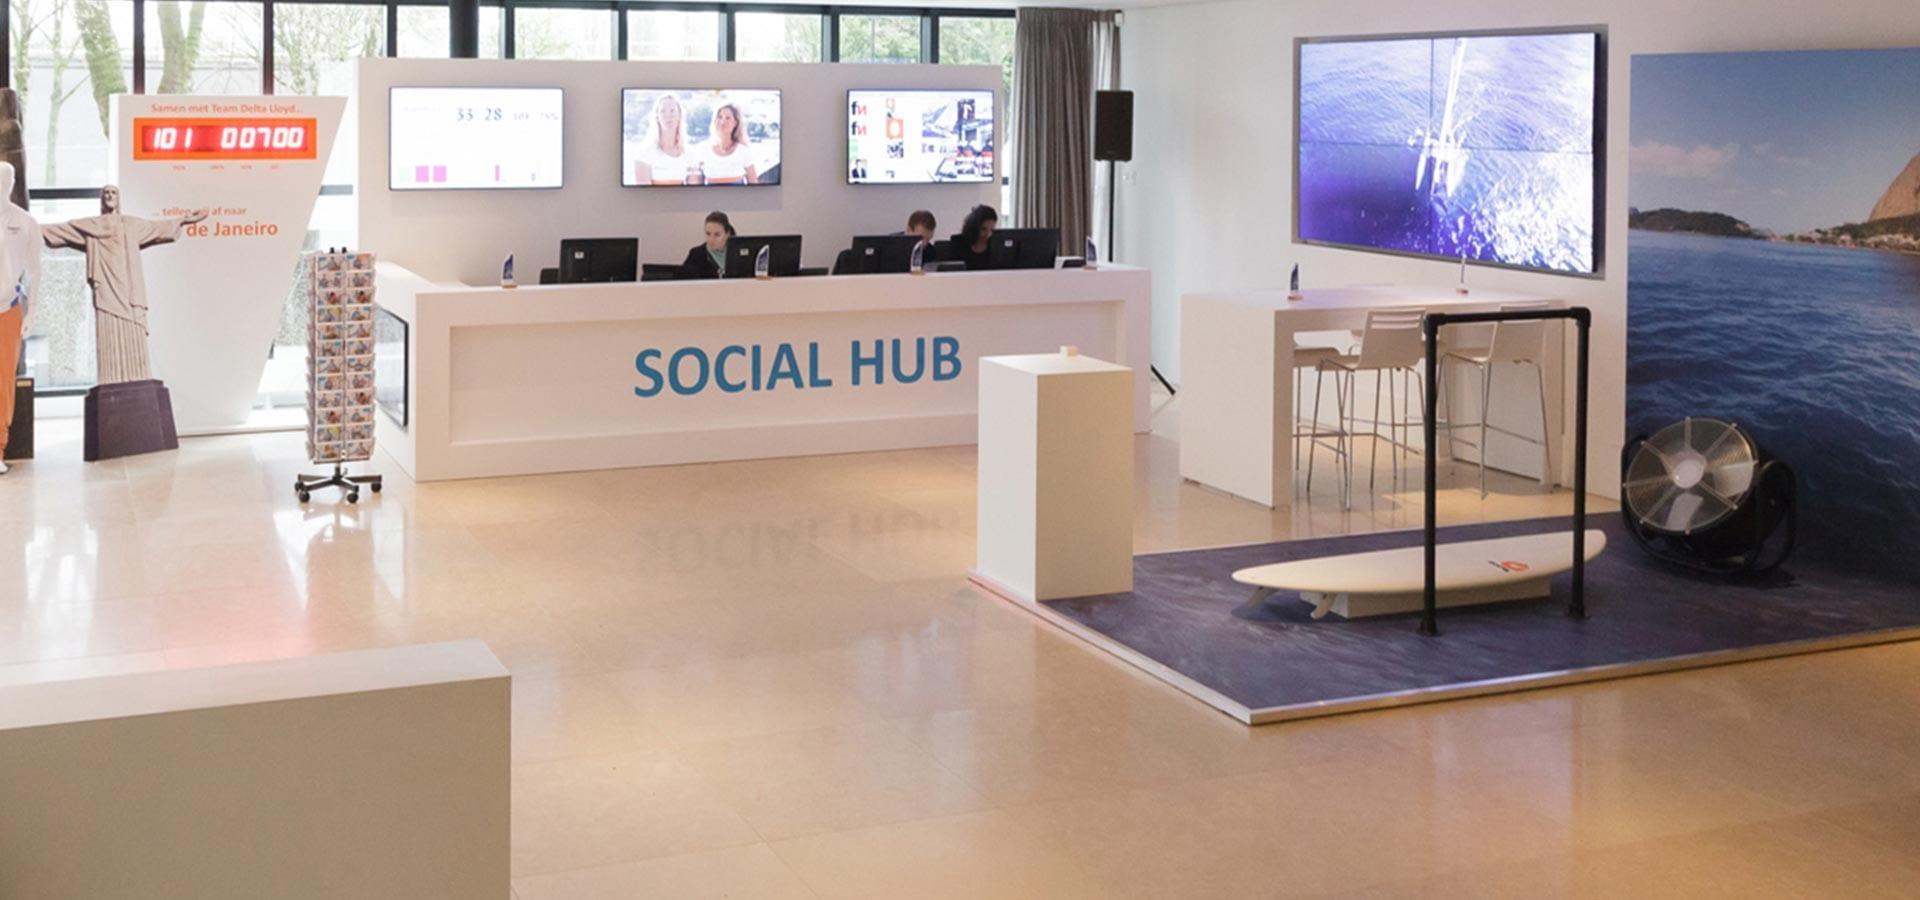 Social areas